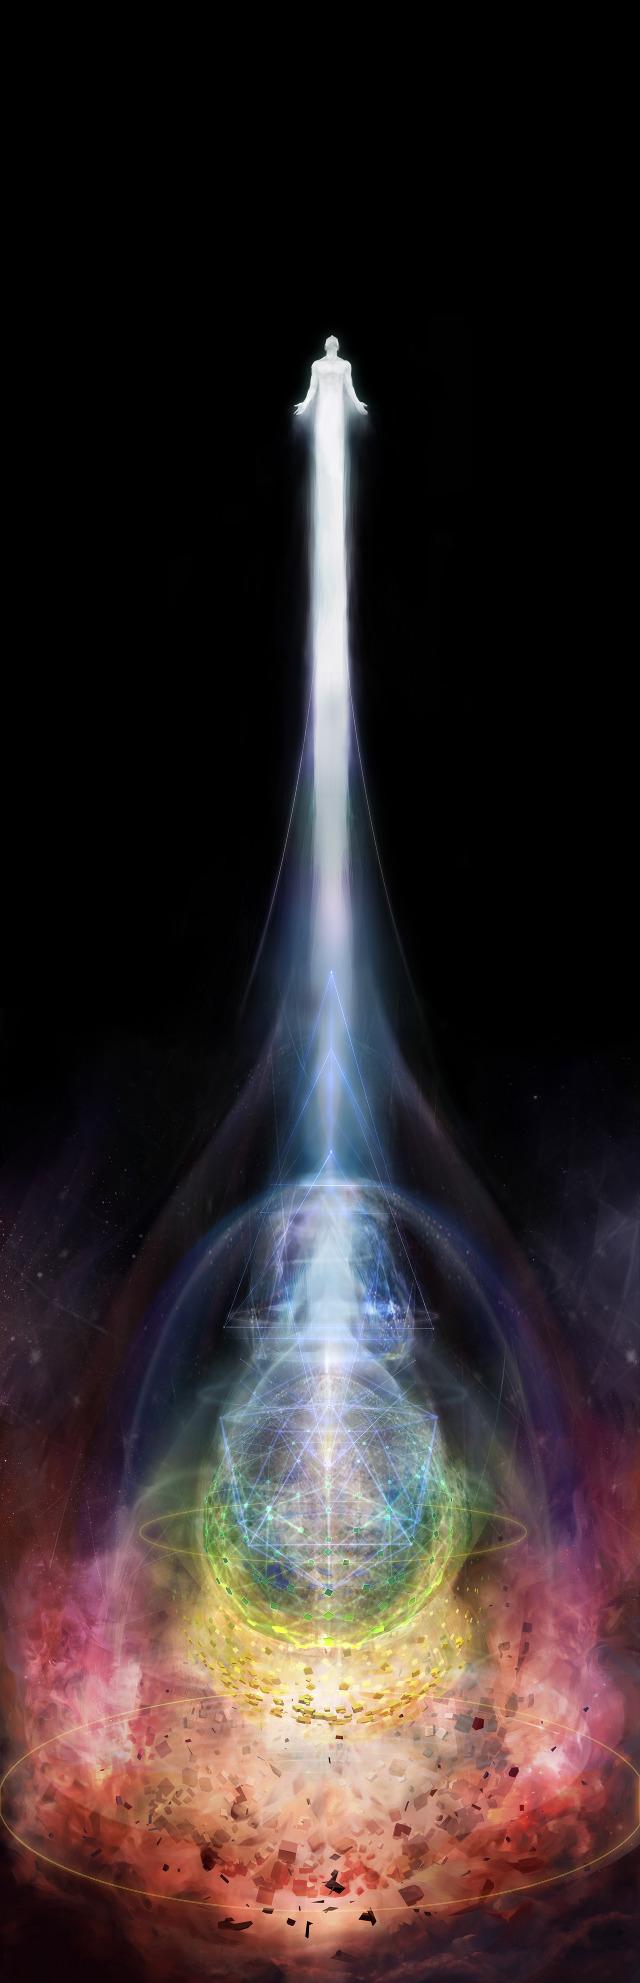 Ascension take off